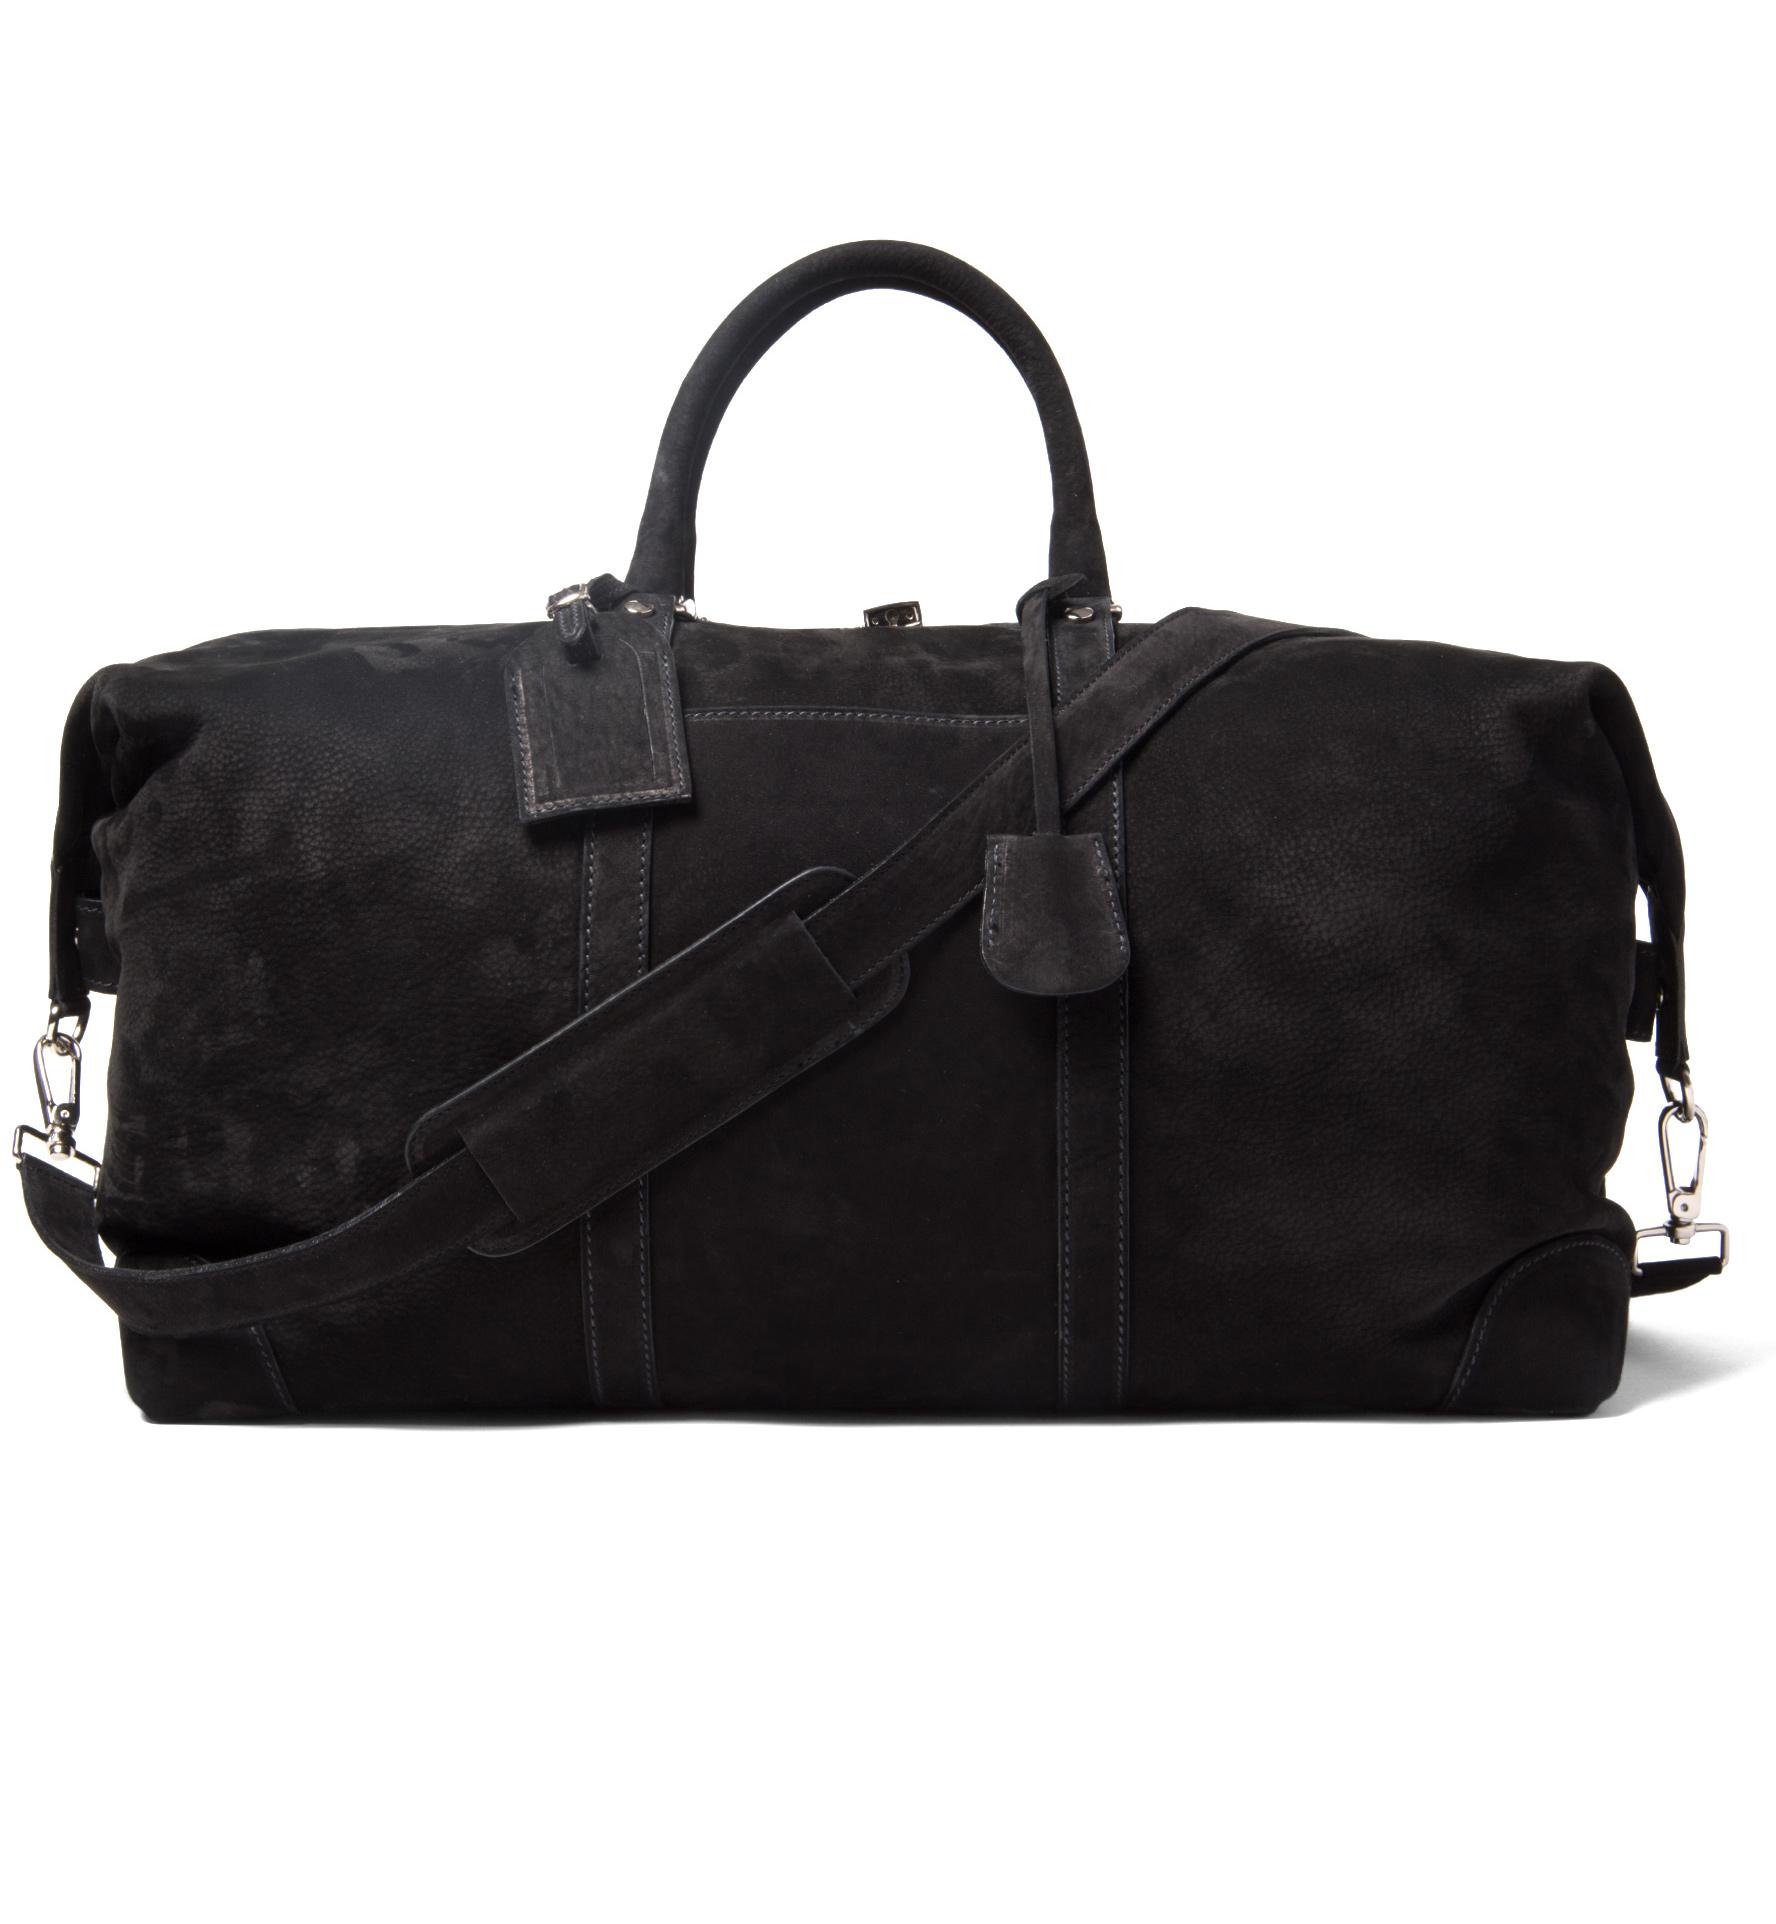 Zoom Image of Italian Black Nubuck Duffle Bag